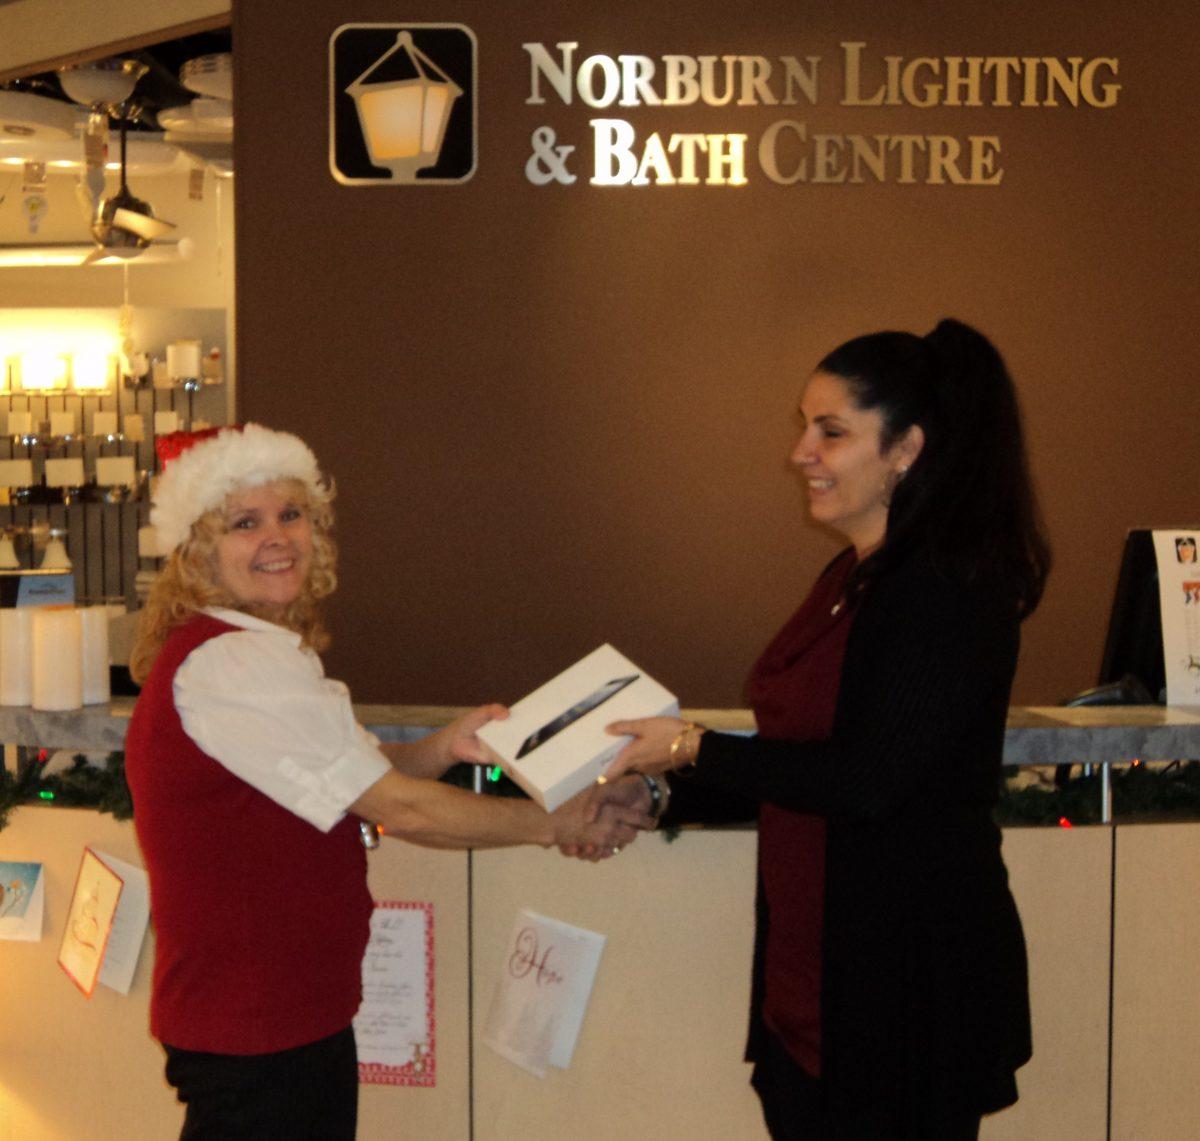 Norburn Dec 2012 114